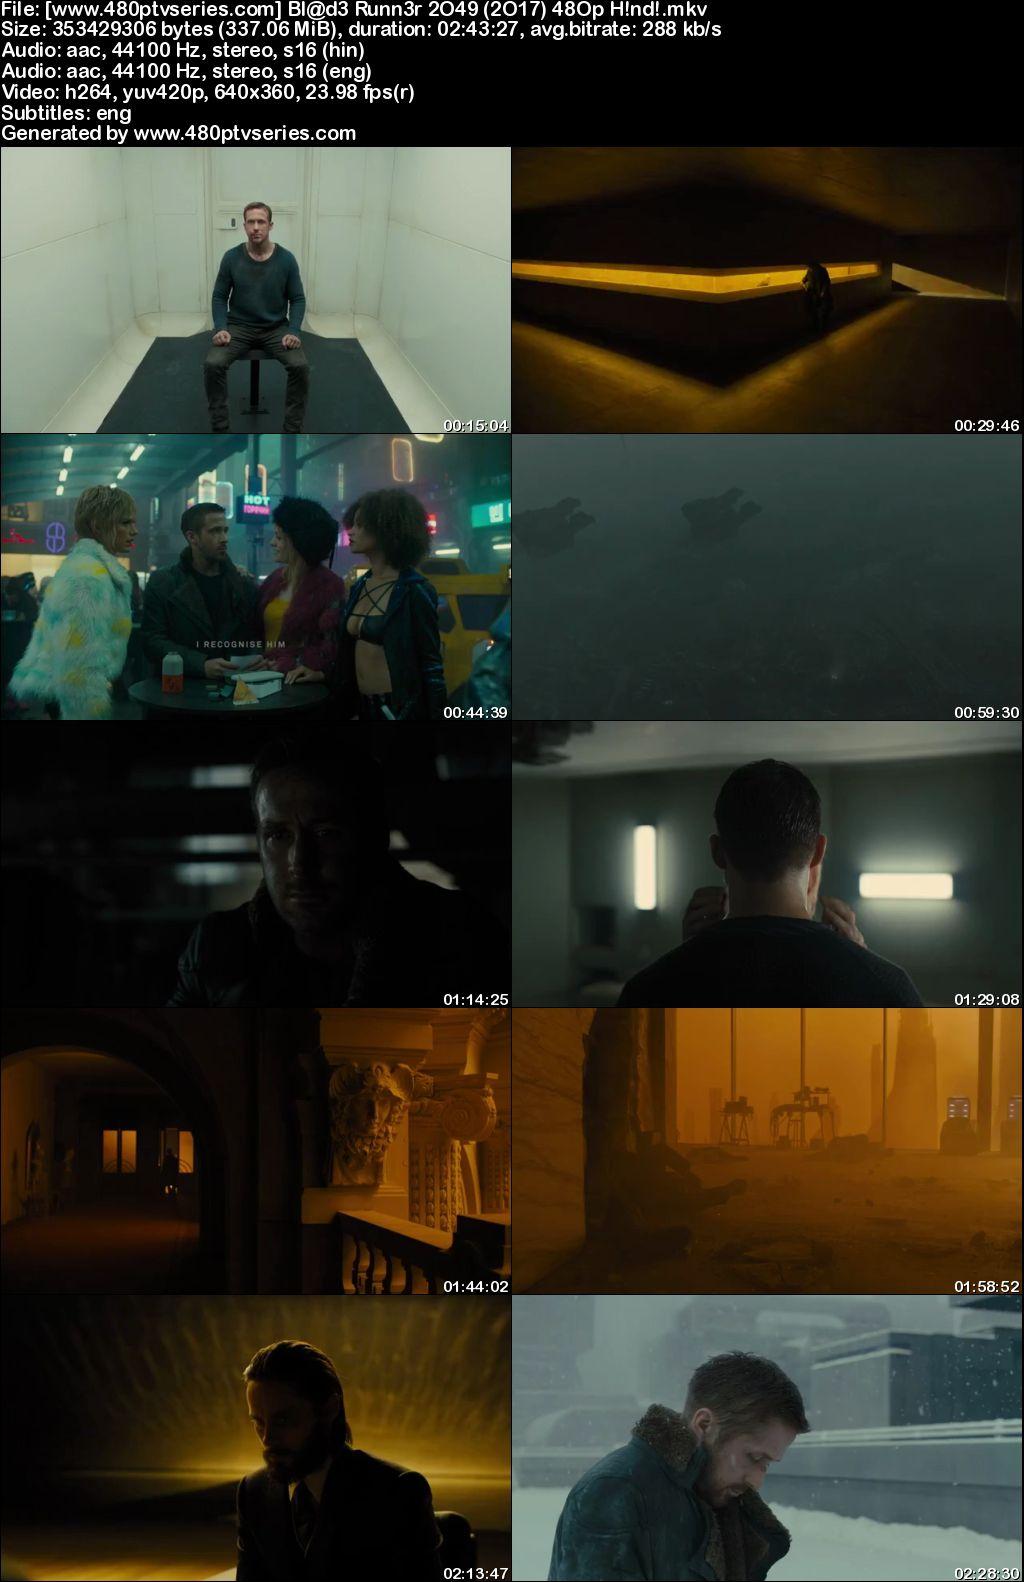 Blade Runner 2049 (2017) 300MB Full Hindi Dual Audio Movie Download 480p Bluray Free Watch Online Full Movie Download Worldfree4u 9xmovies